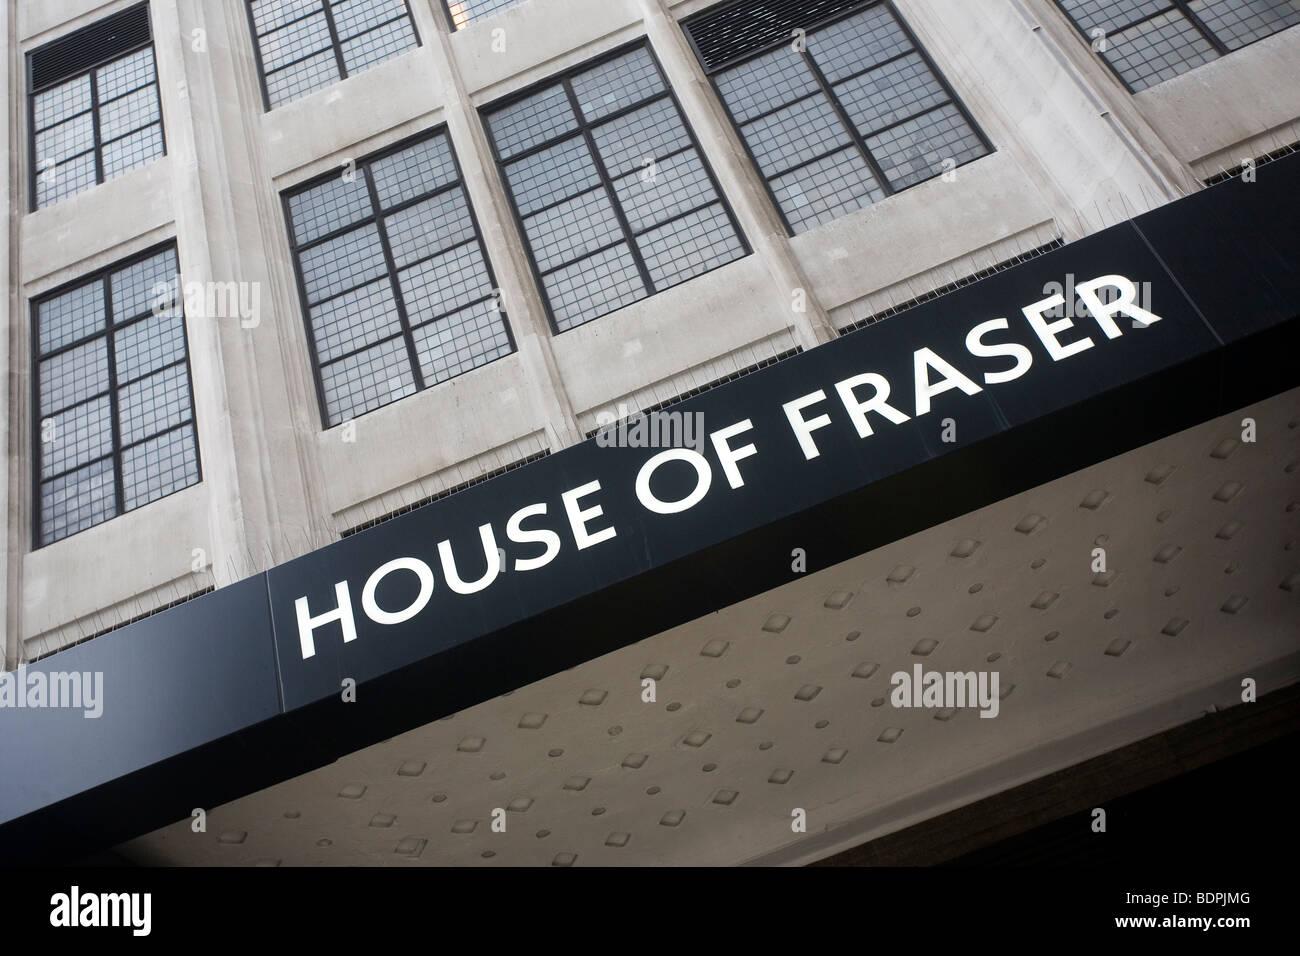 House of Fraser shop sign - Stock Image